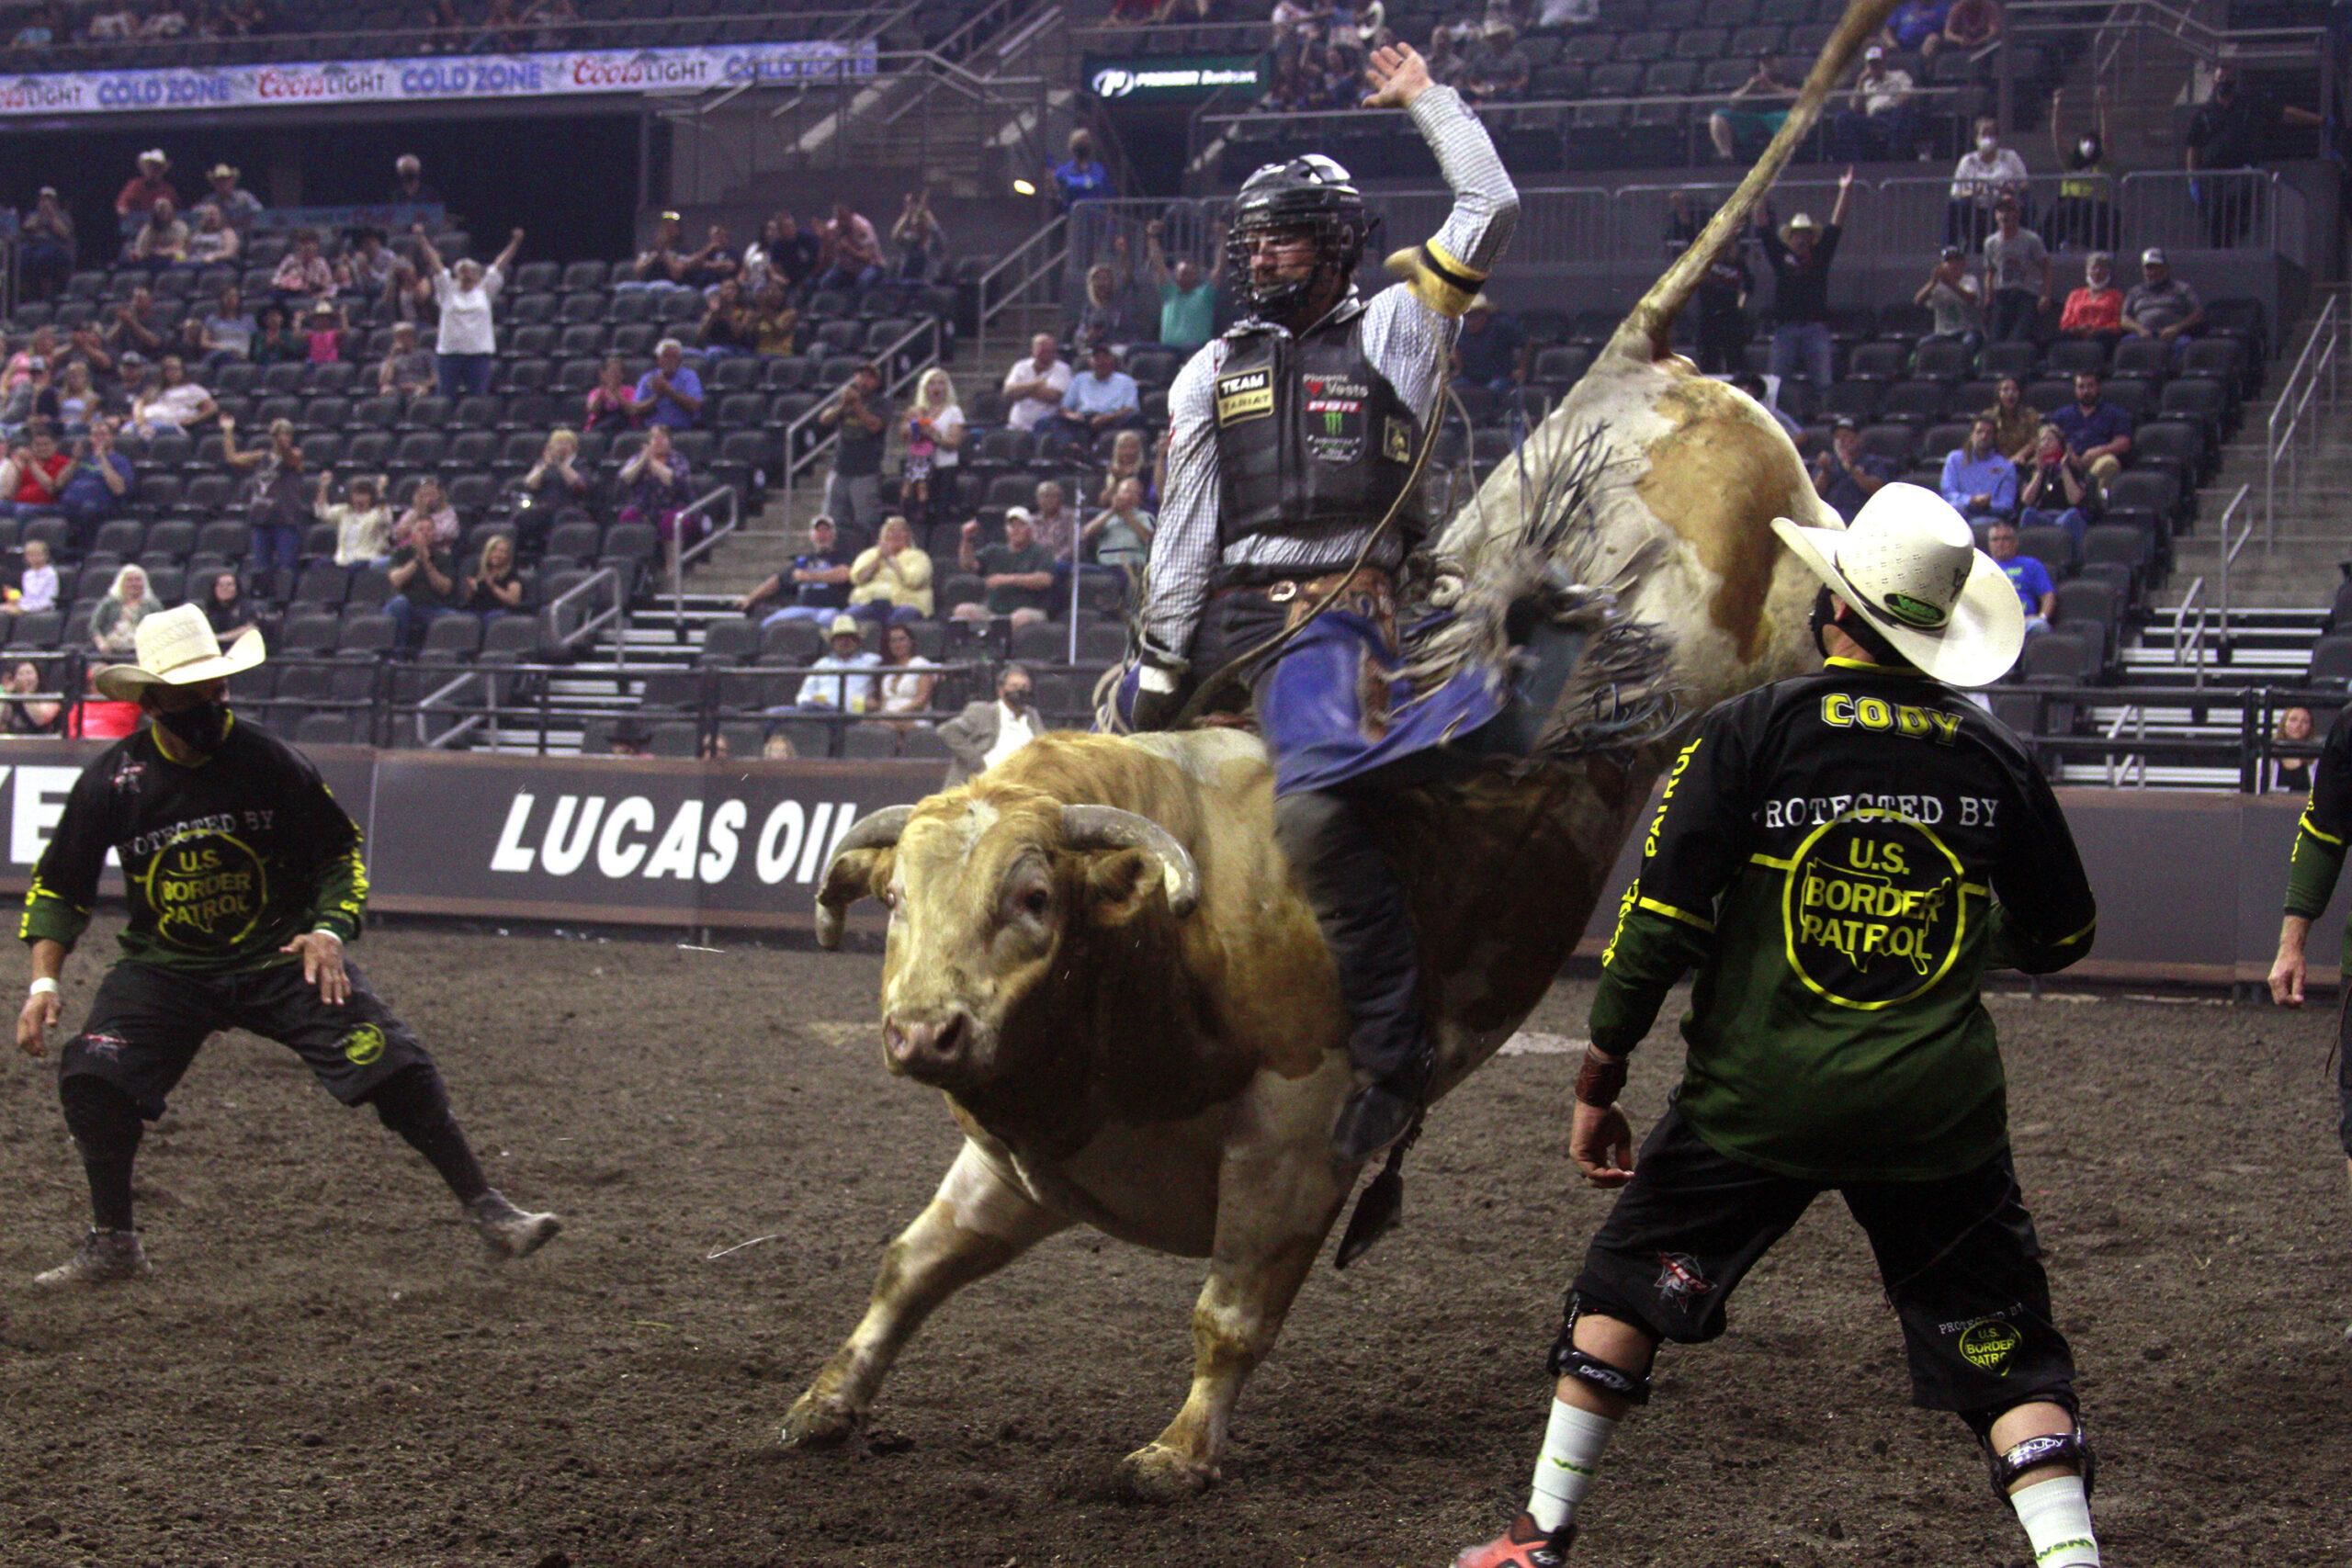 CORRECTION Bull Riding Crowds